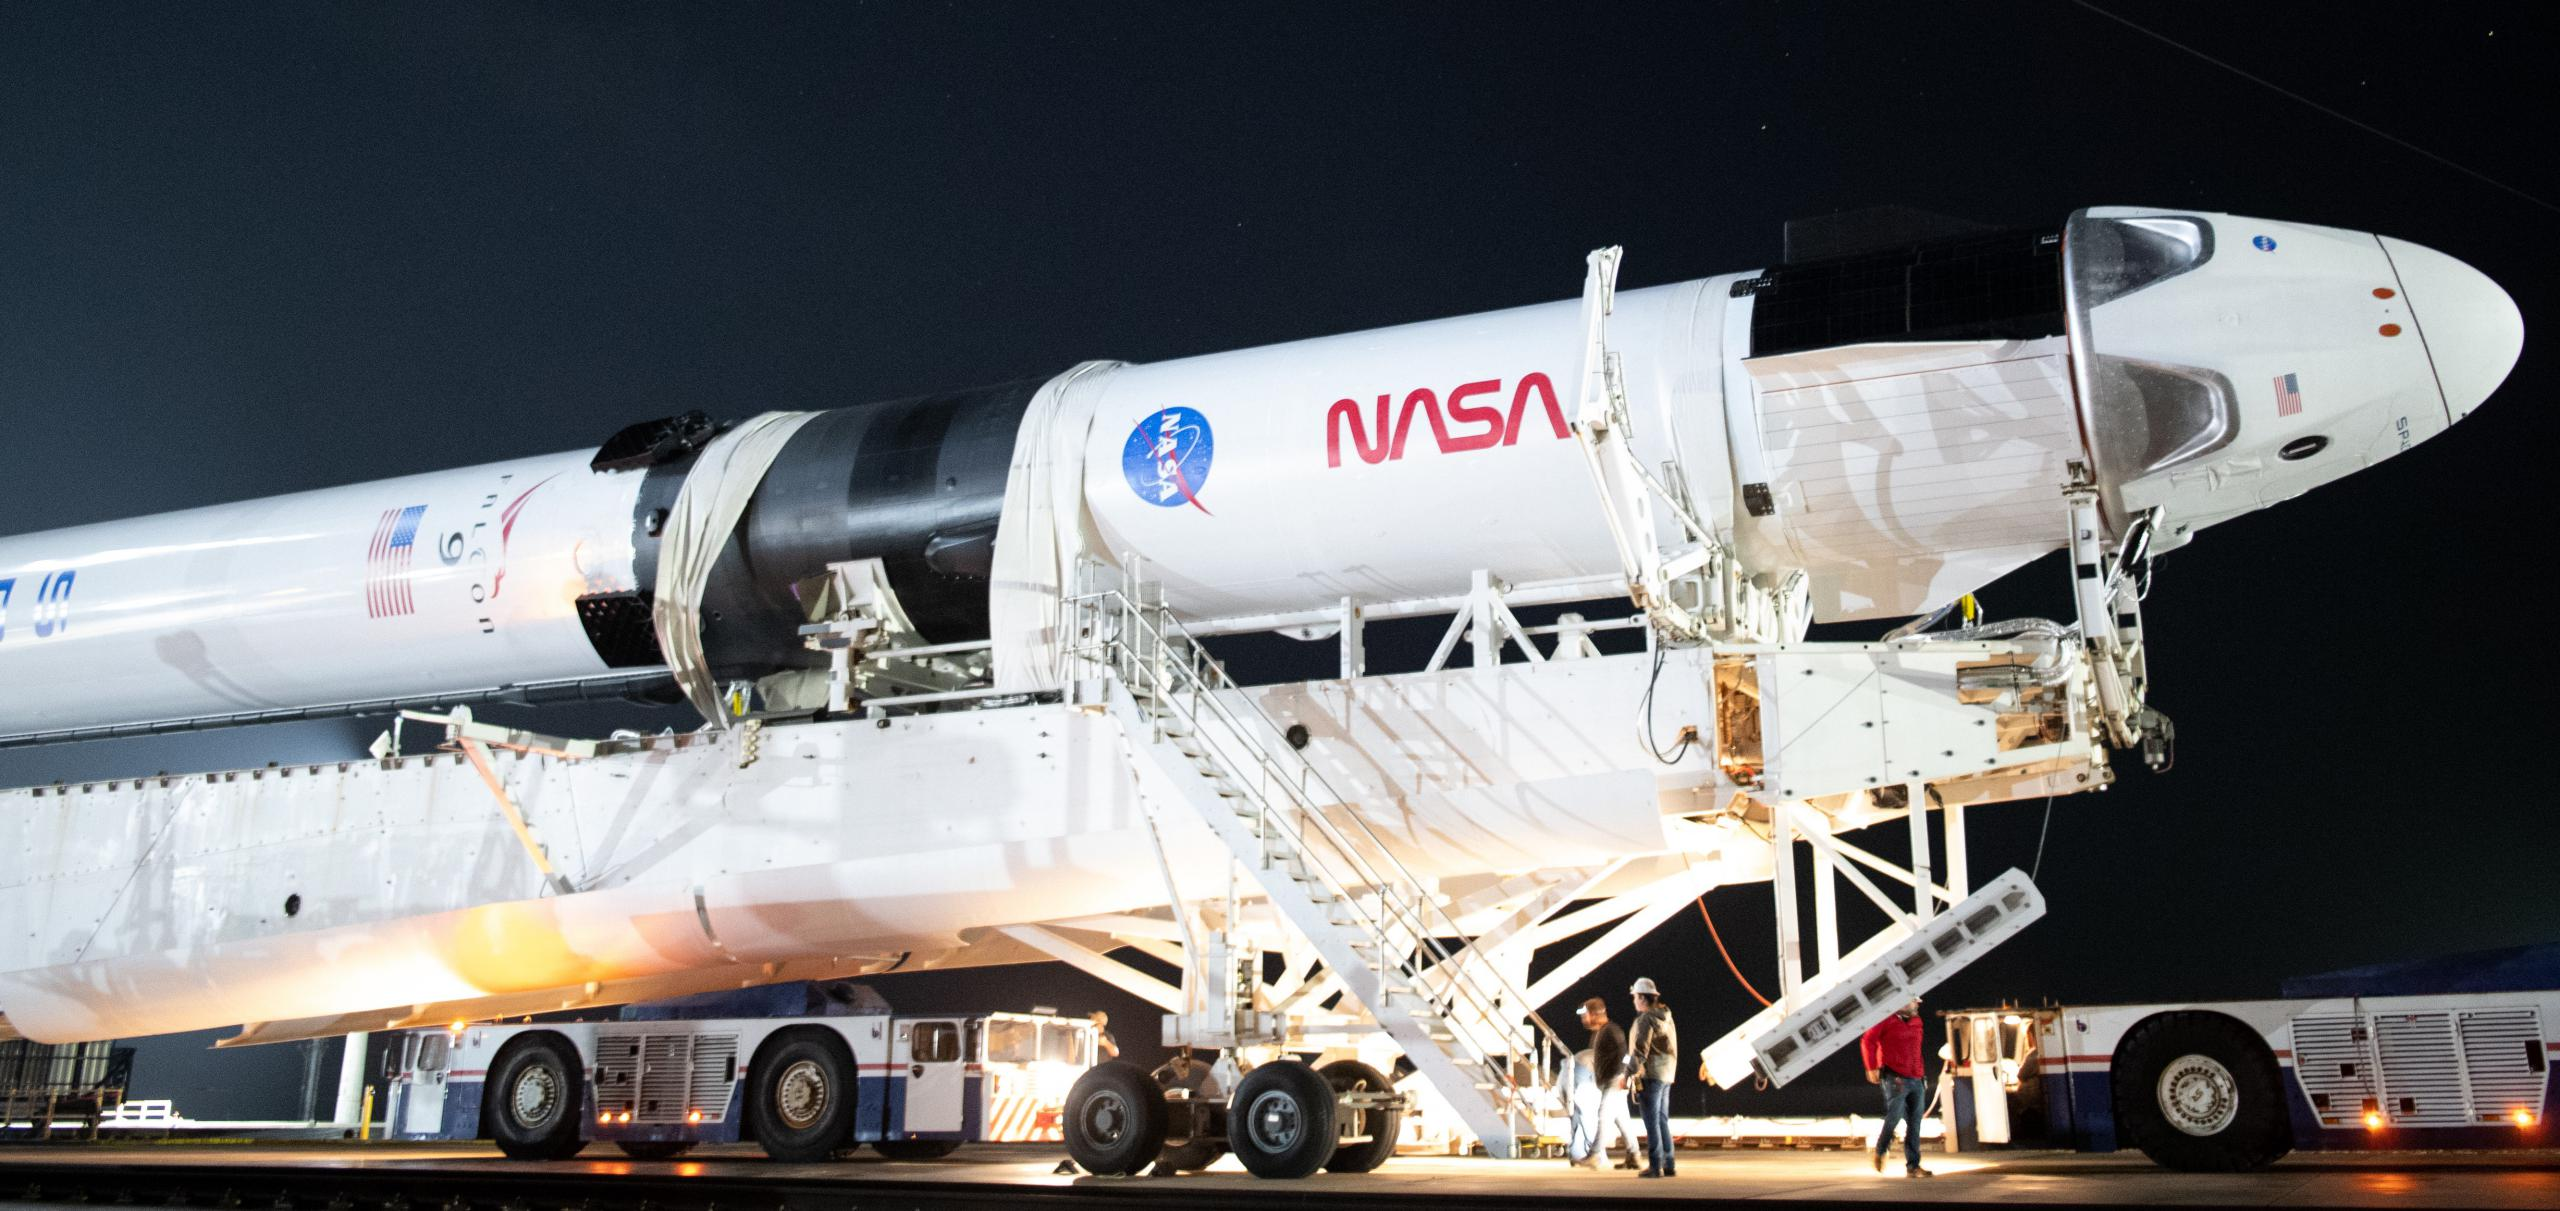 Crew-1 Crew Dragon C207 Falcon 9 B1061 39A 110820 (NASA) rollout 9 crop (c)